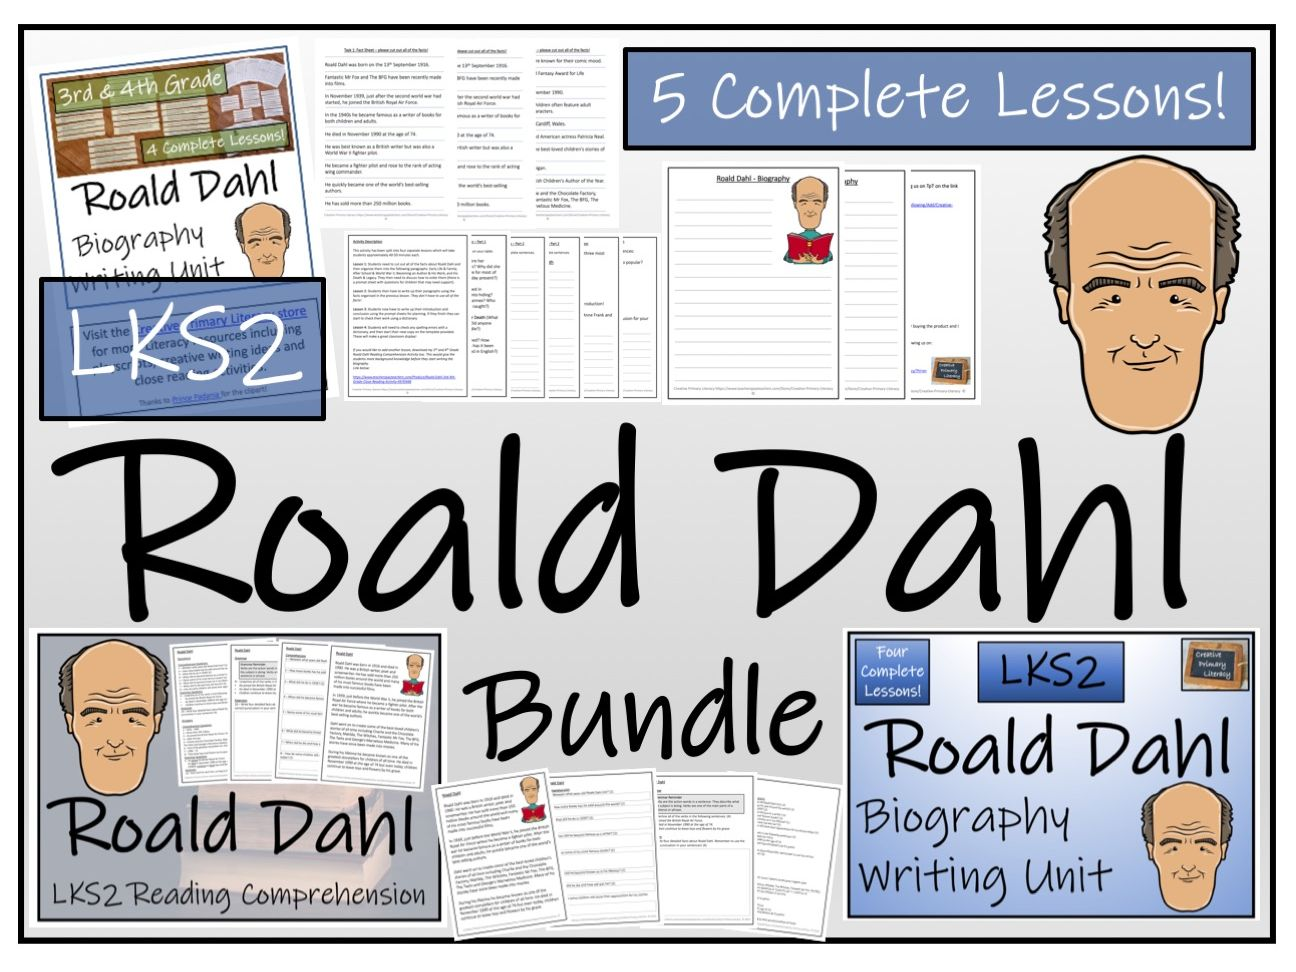 LKS2 Literacy - Roald Dahl Reading Comprehension & Biography Bundle